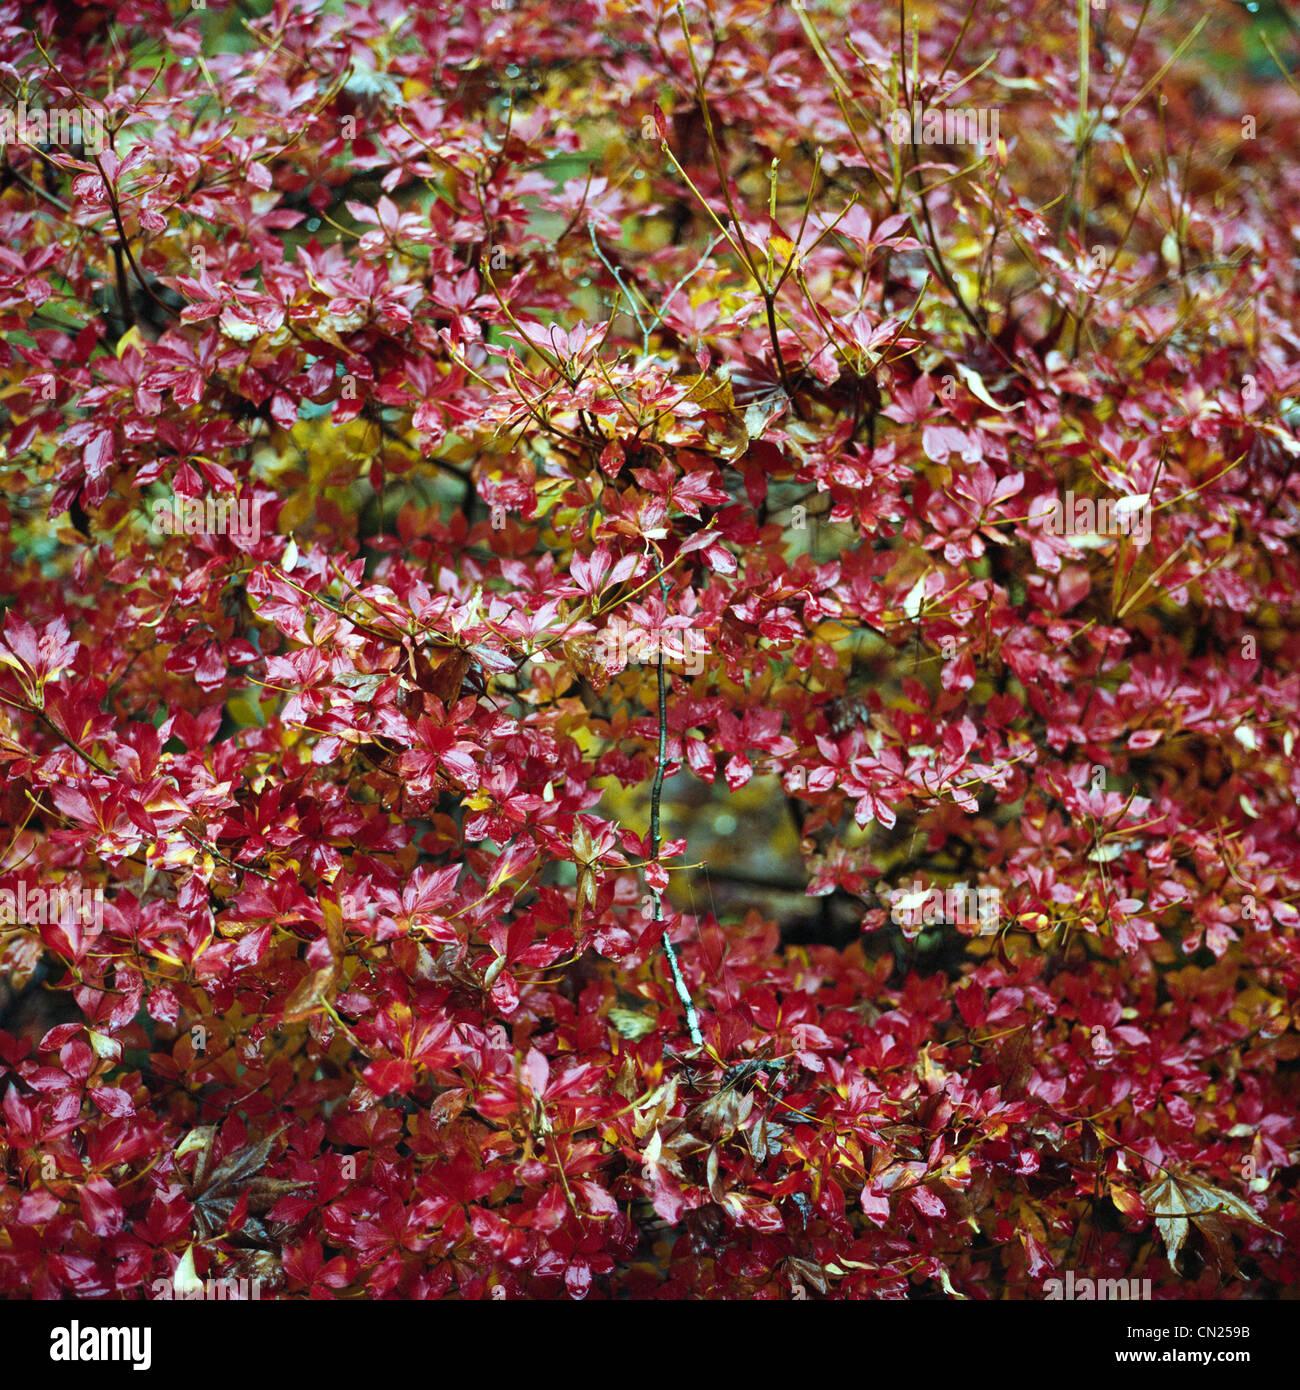 Autumn leaves - Stock Image